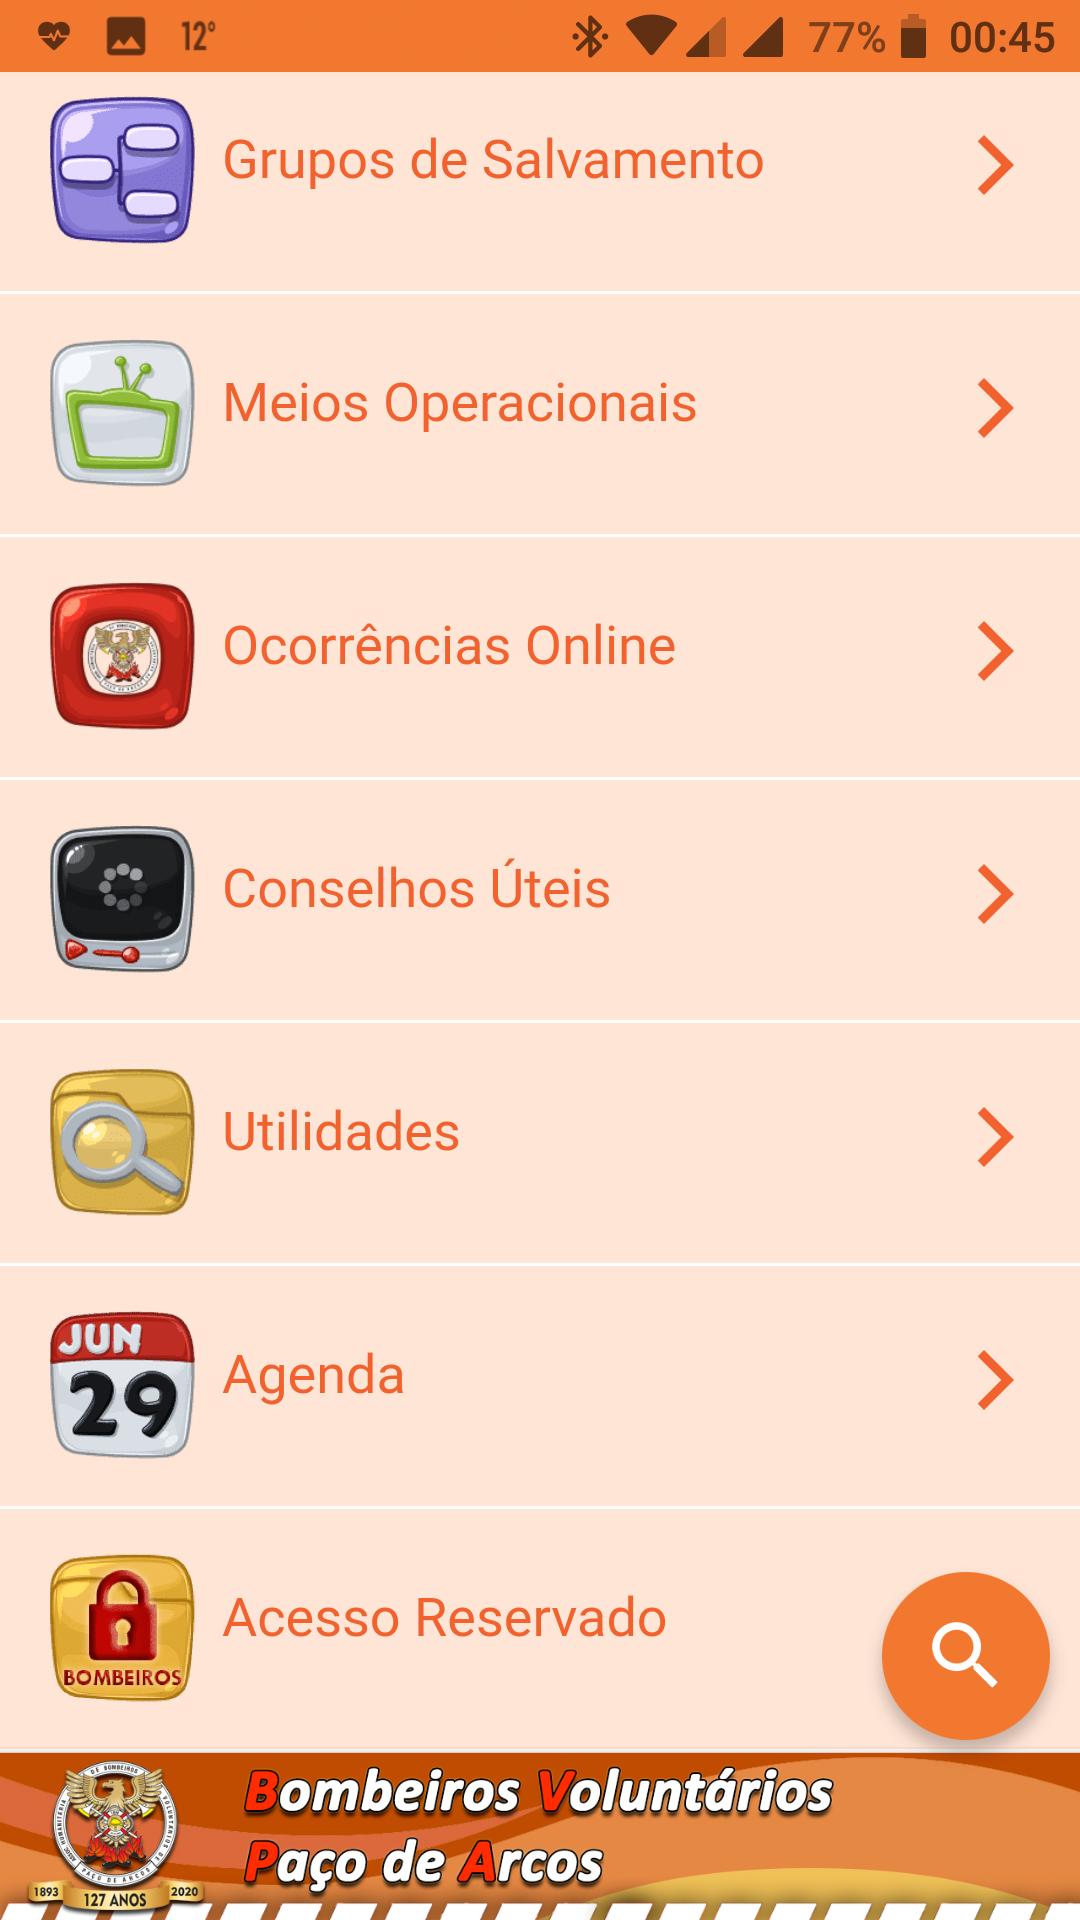 app_bvpacodearcos_20201030 (49)